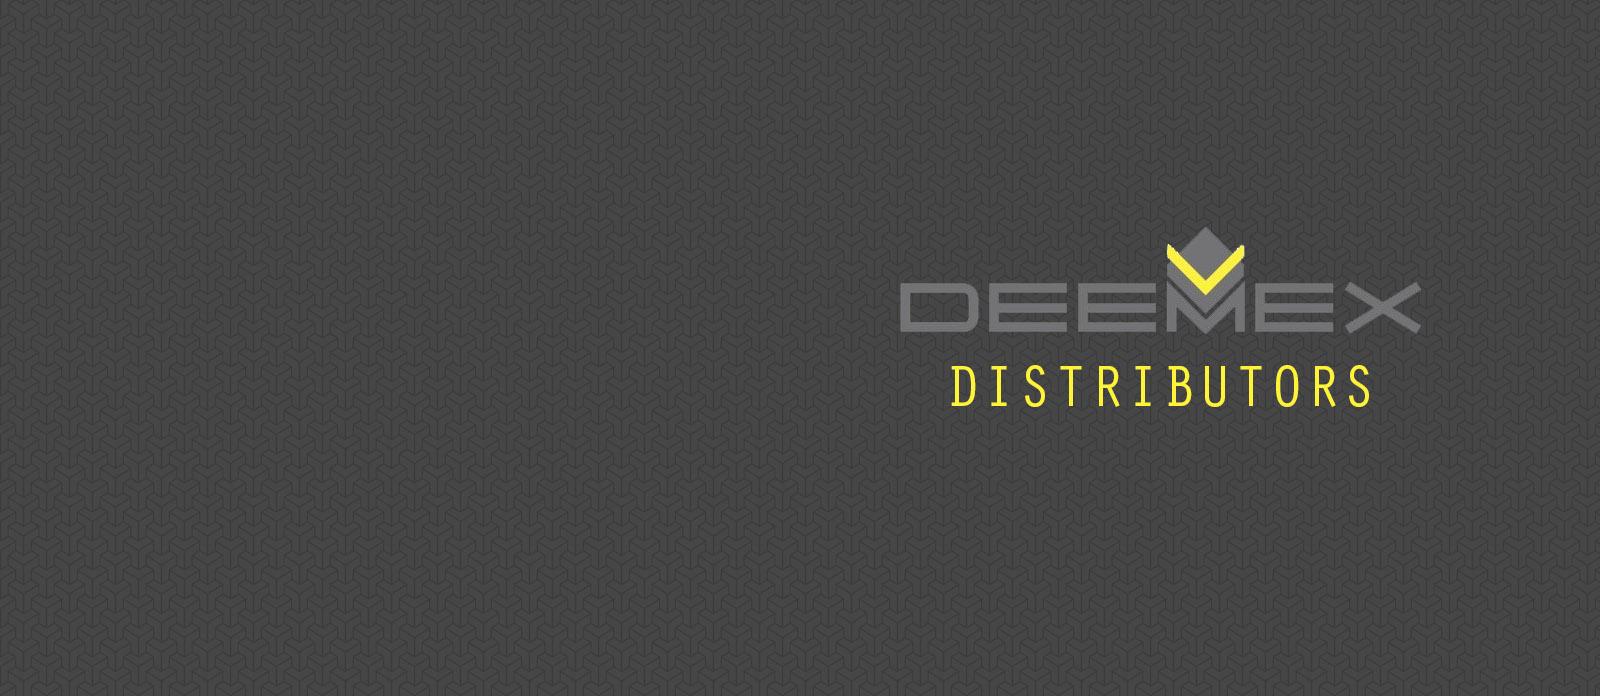 Deemex Distributors